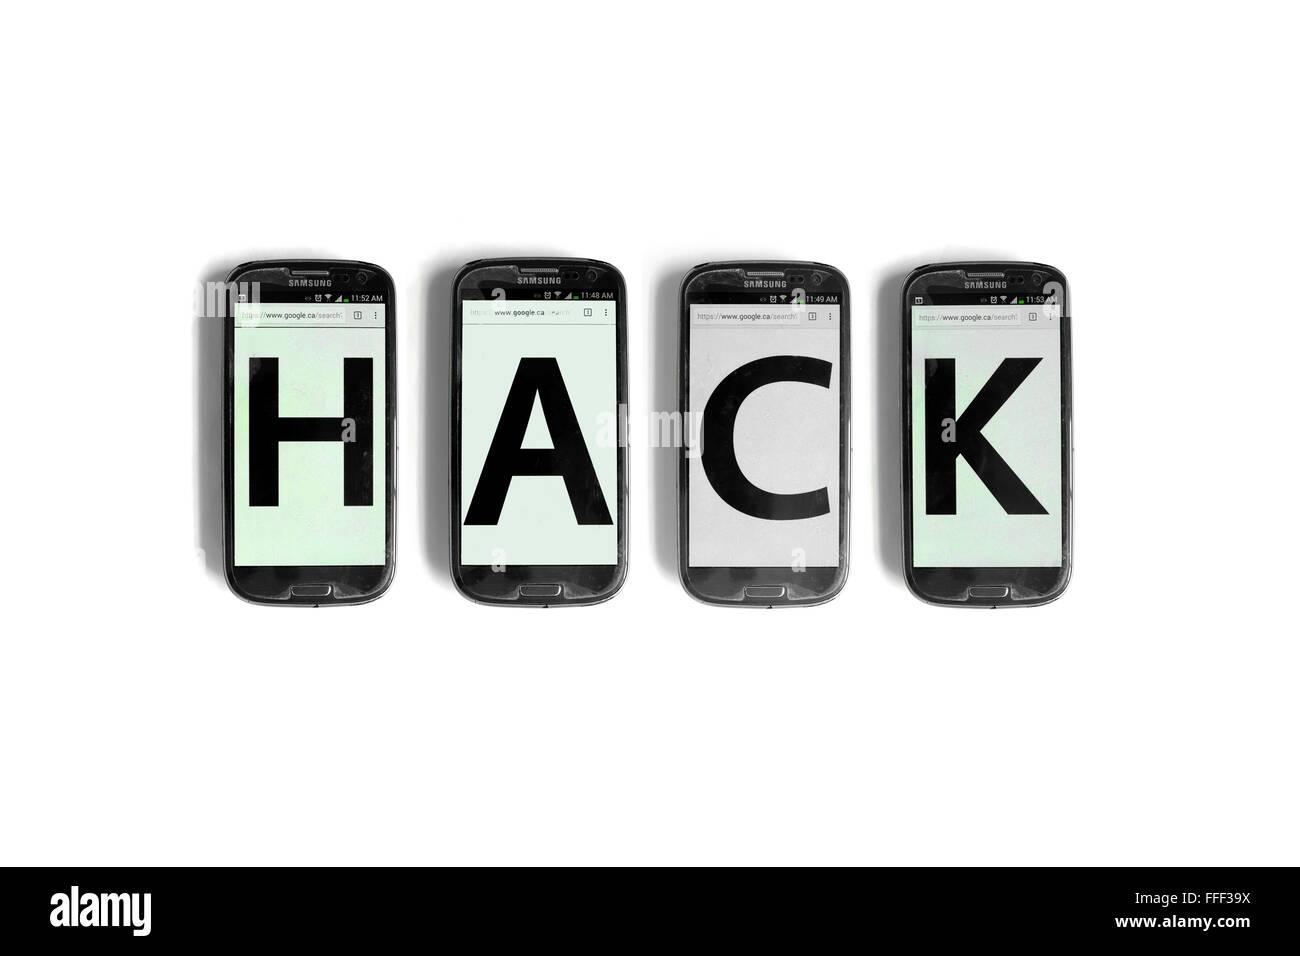 Hack Stock Photos & Hack Stock Images - Alamy